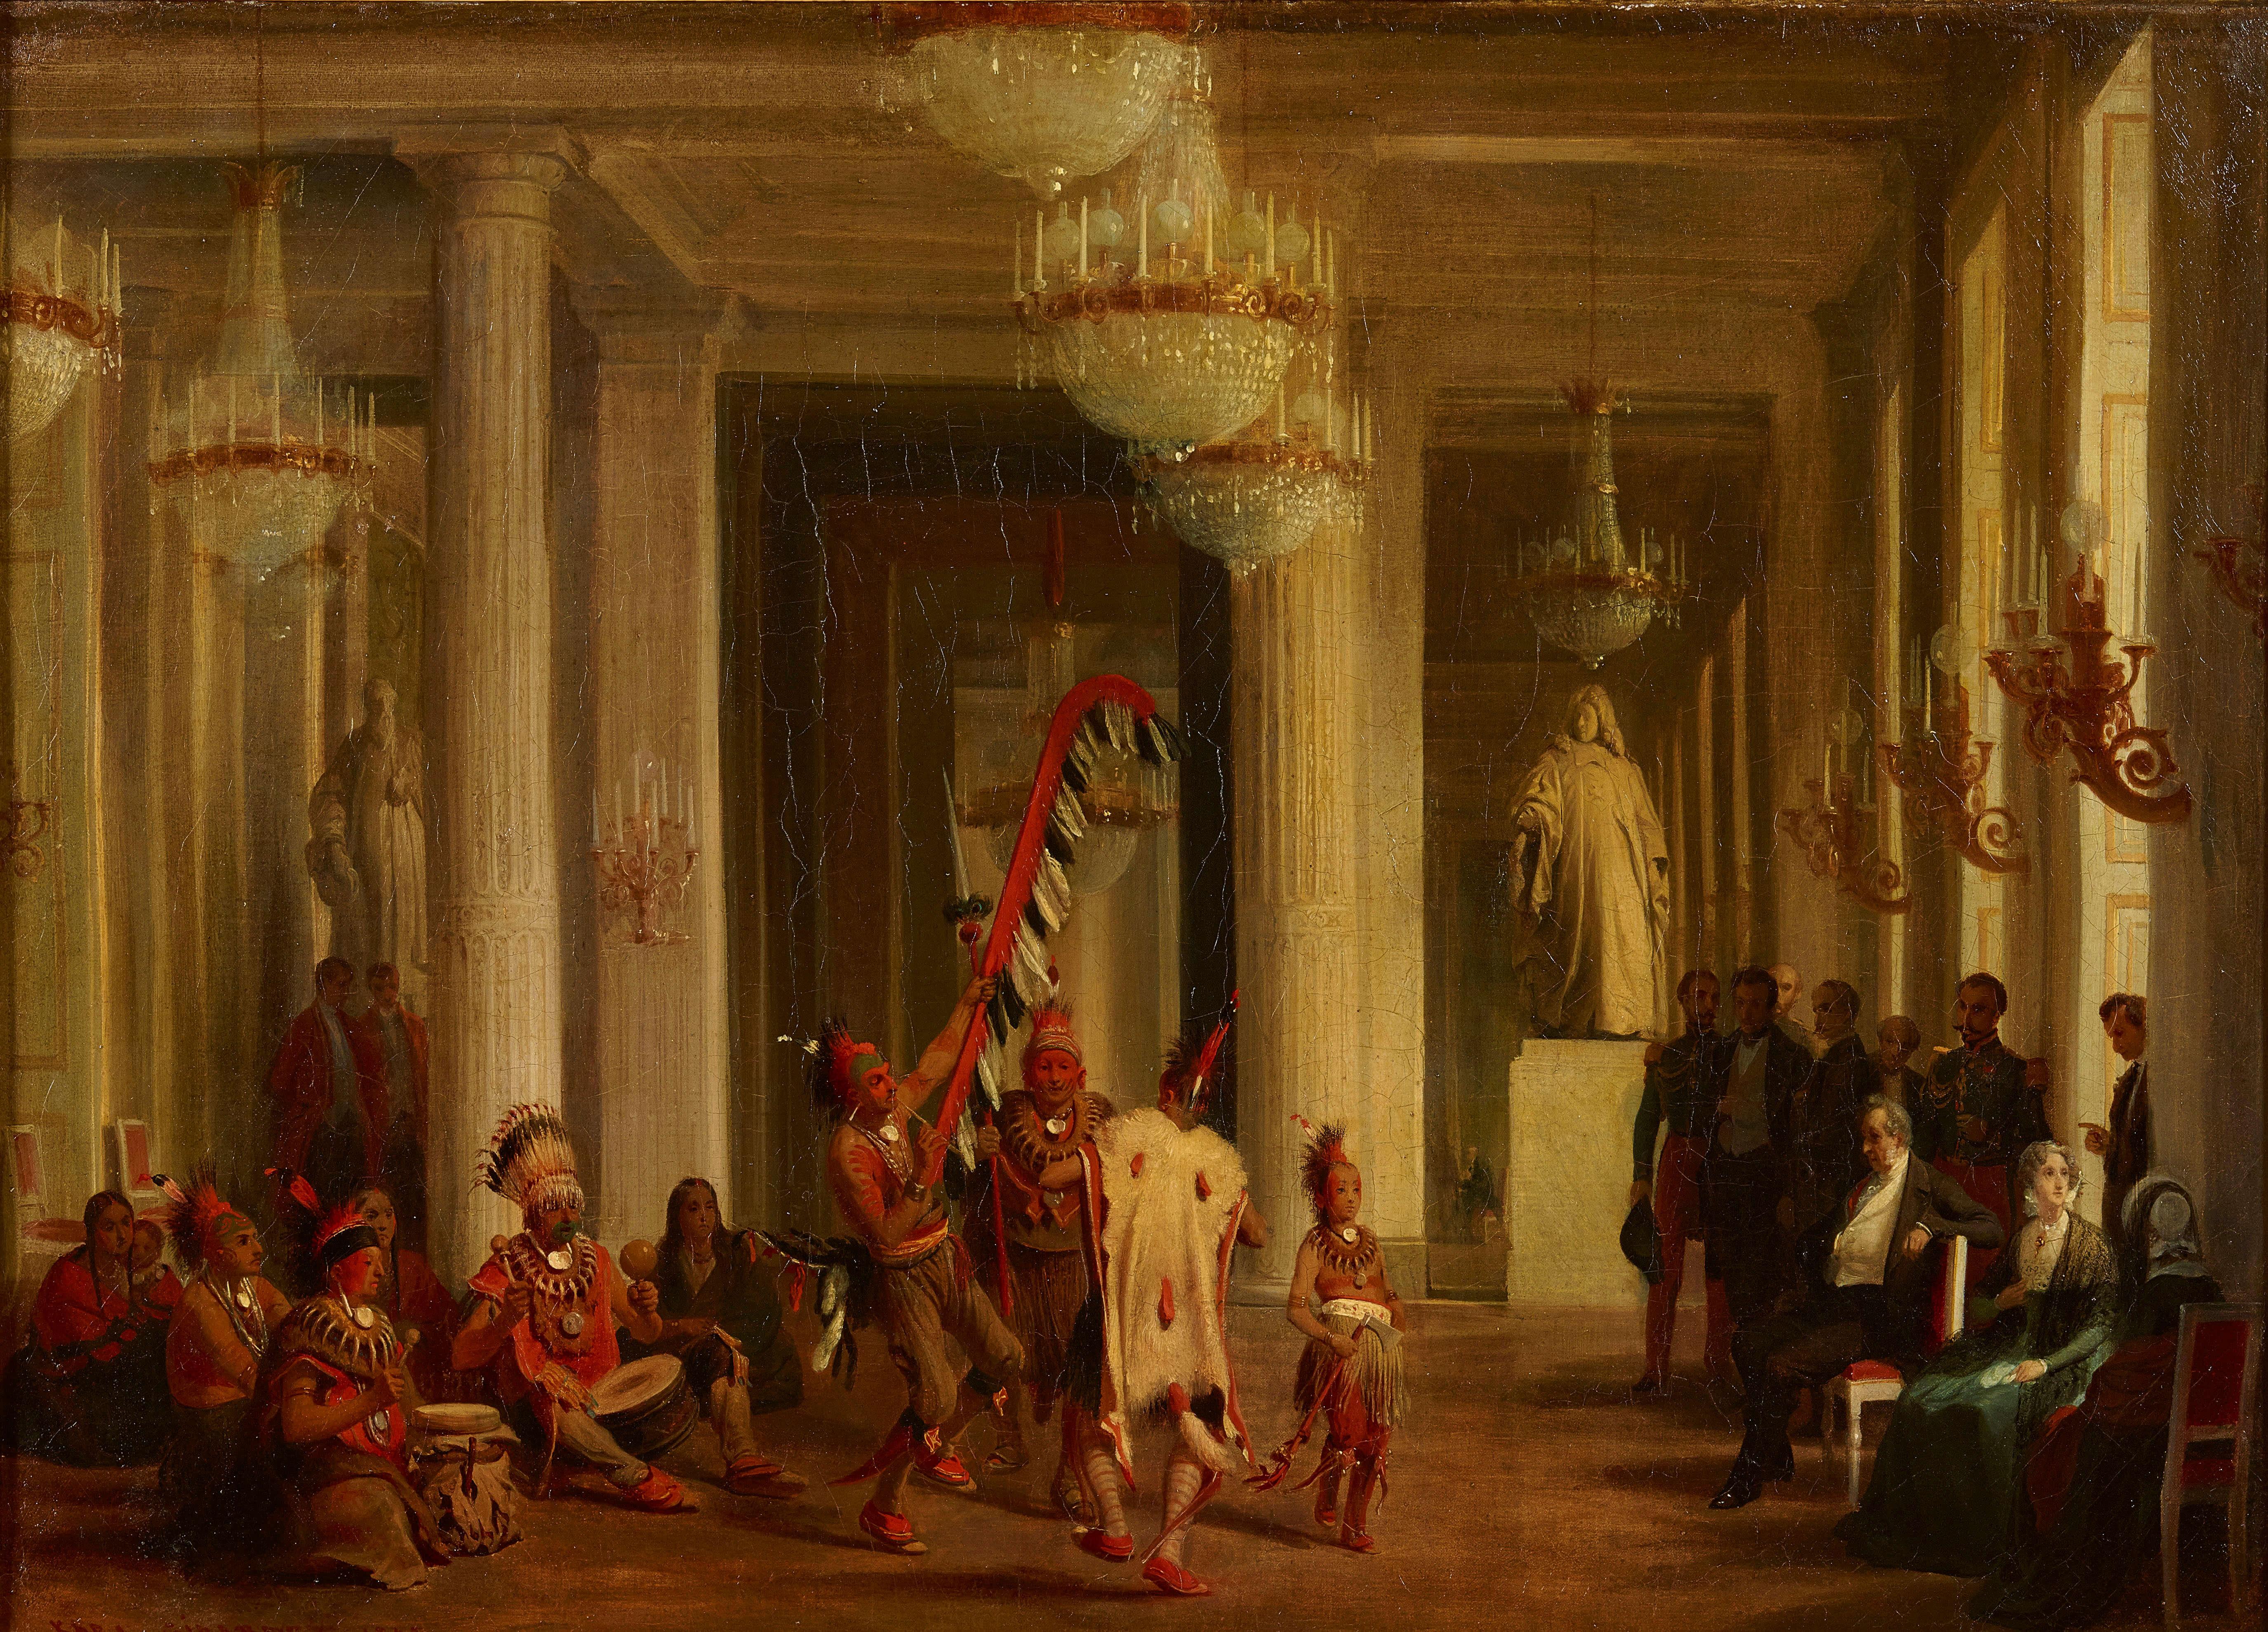 Karl Girardet, Dance of the Iowa Indians